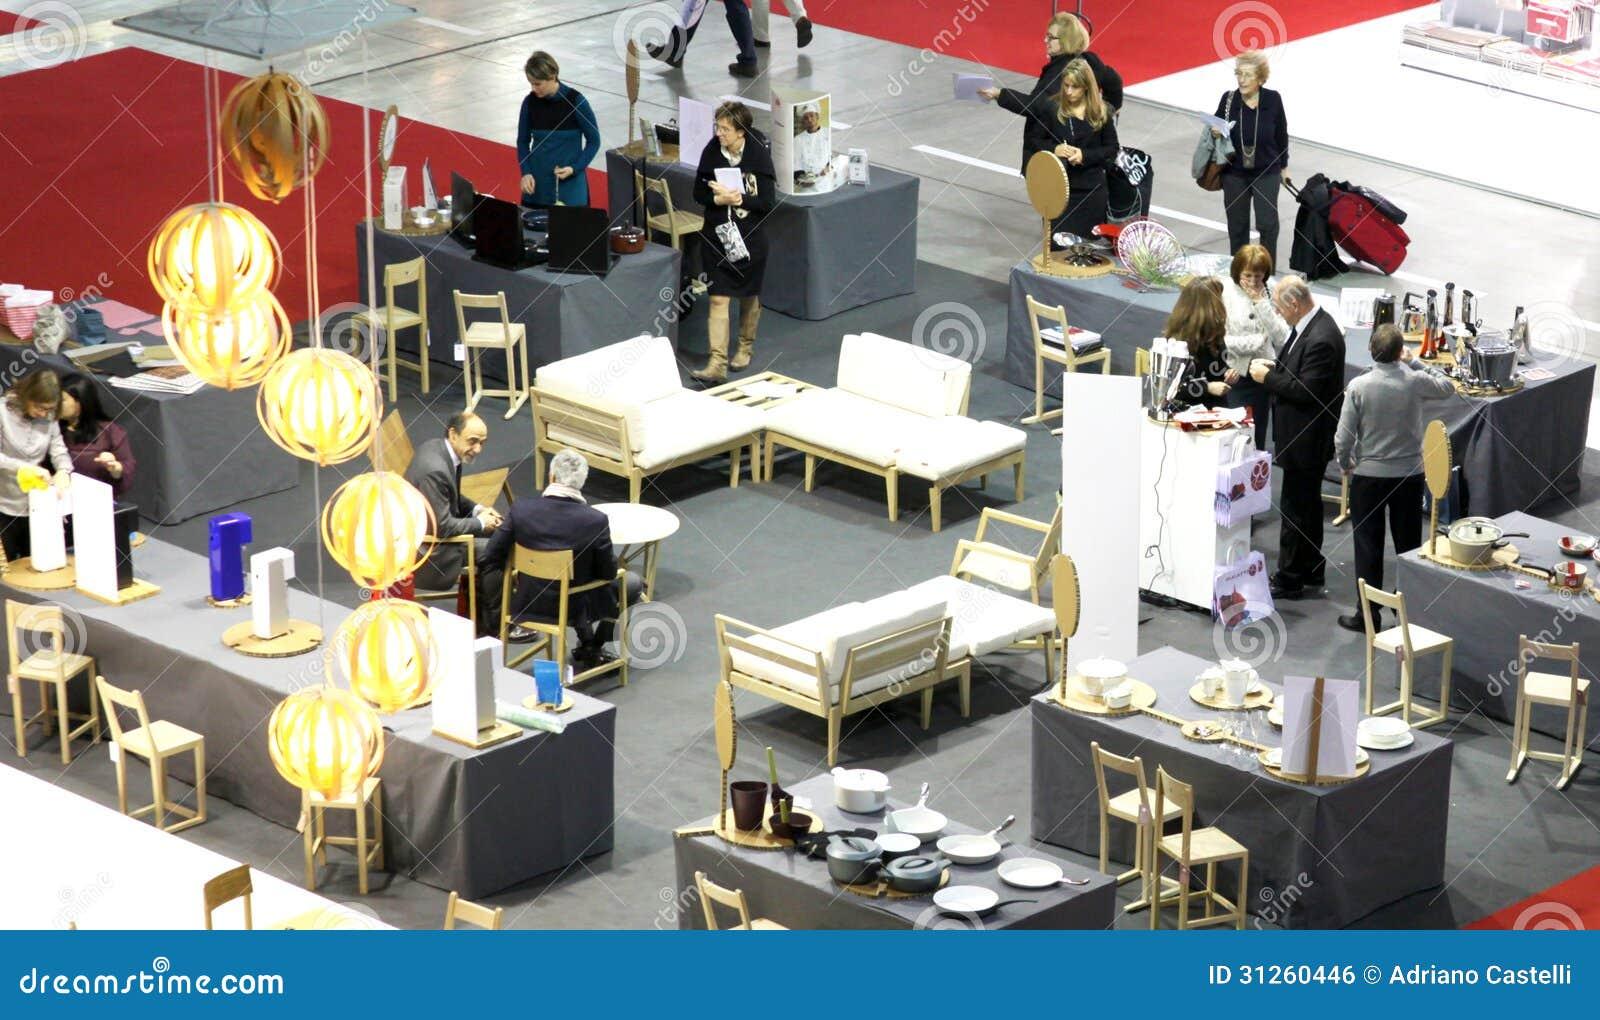 Macef 2013 international home show exhibition editorial photo image 31260446 for International interior design exhibition